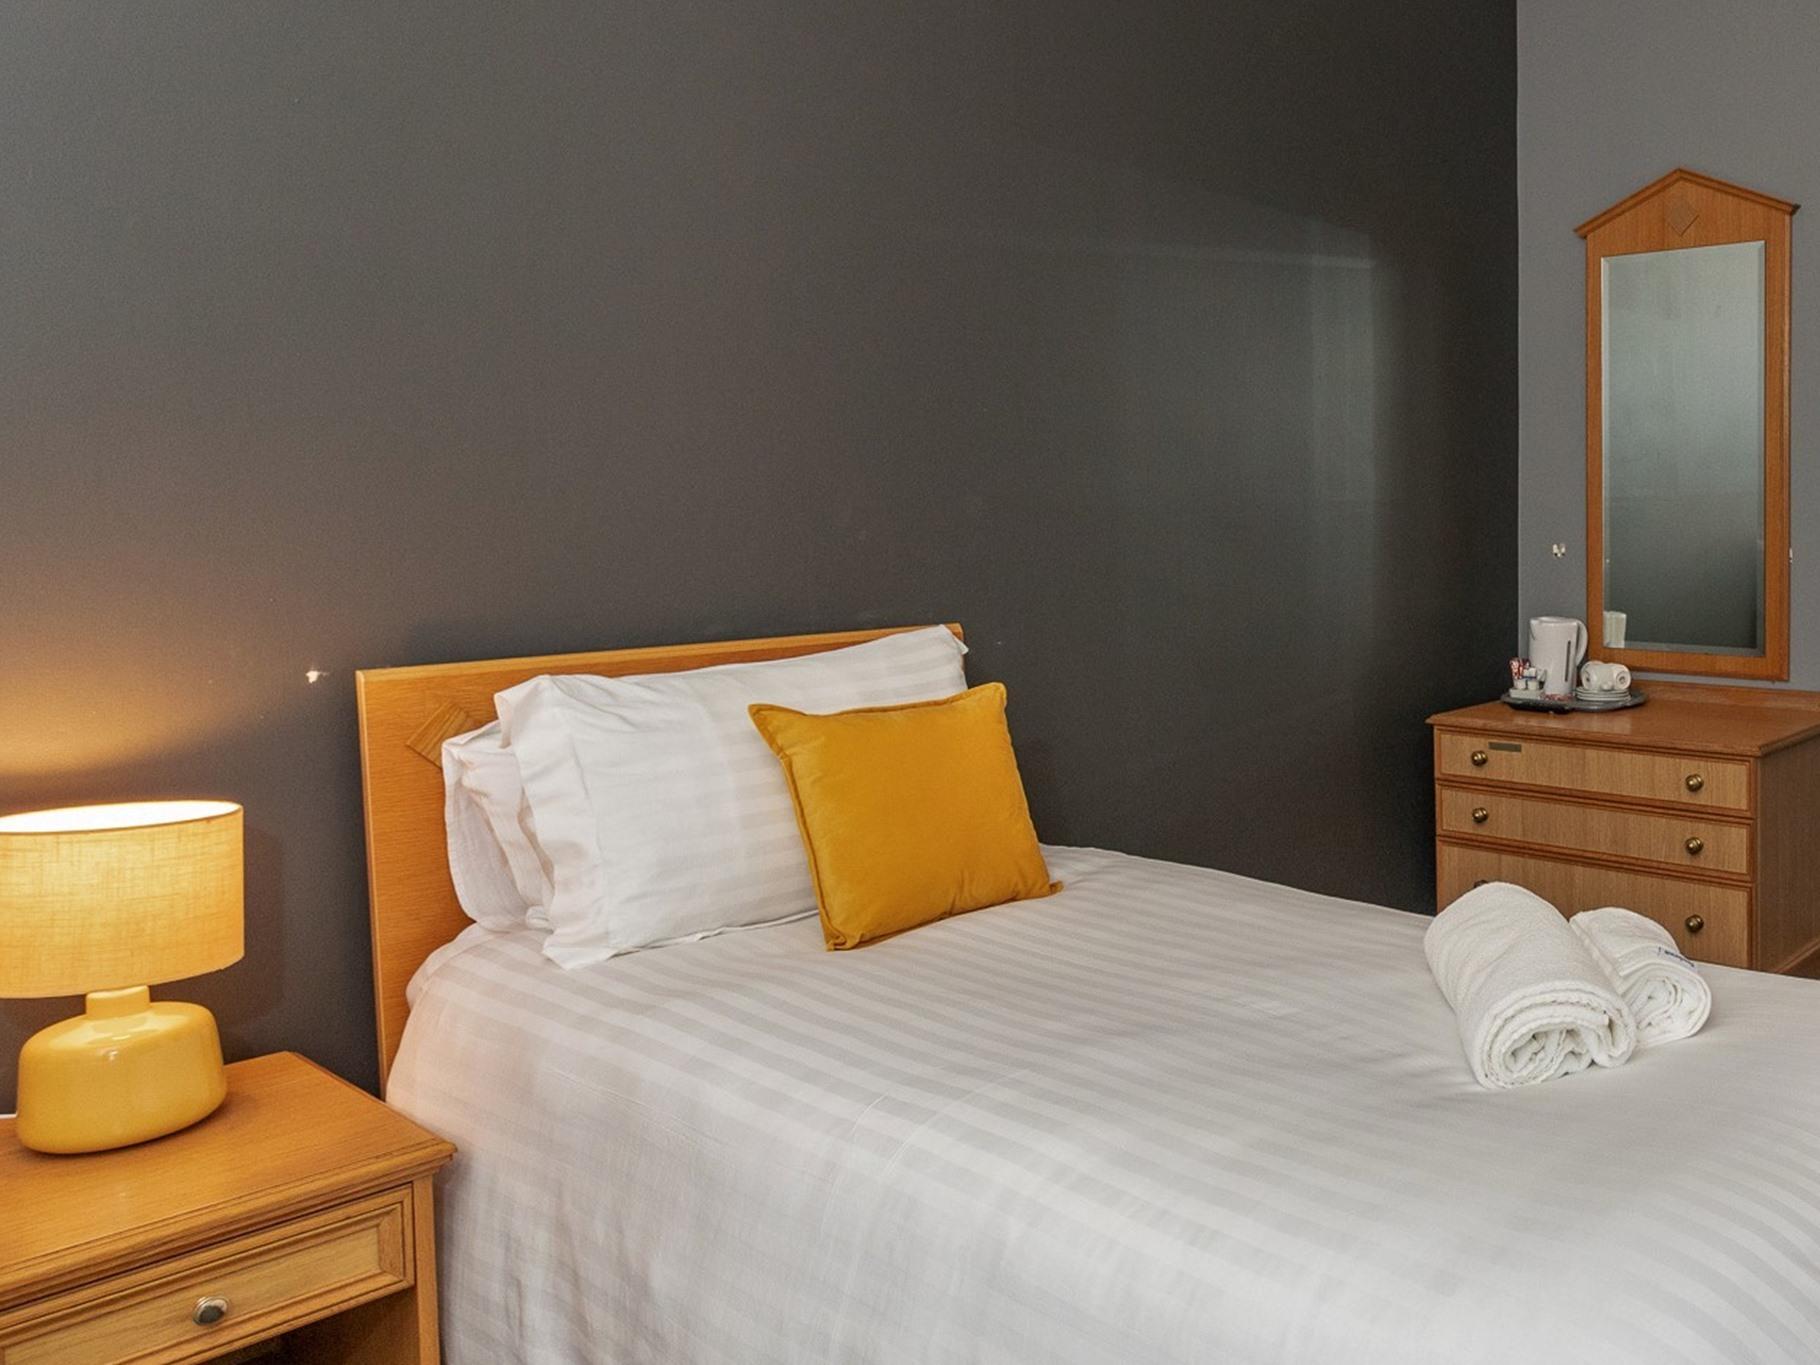 Single Room - Shared facilities